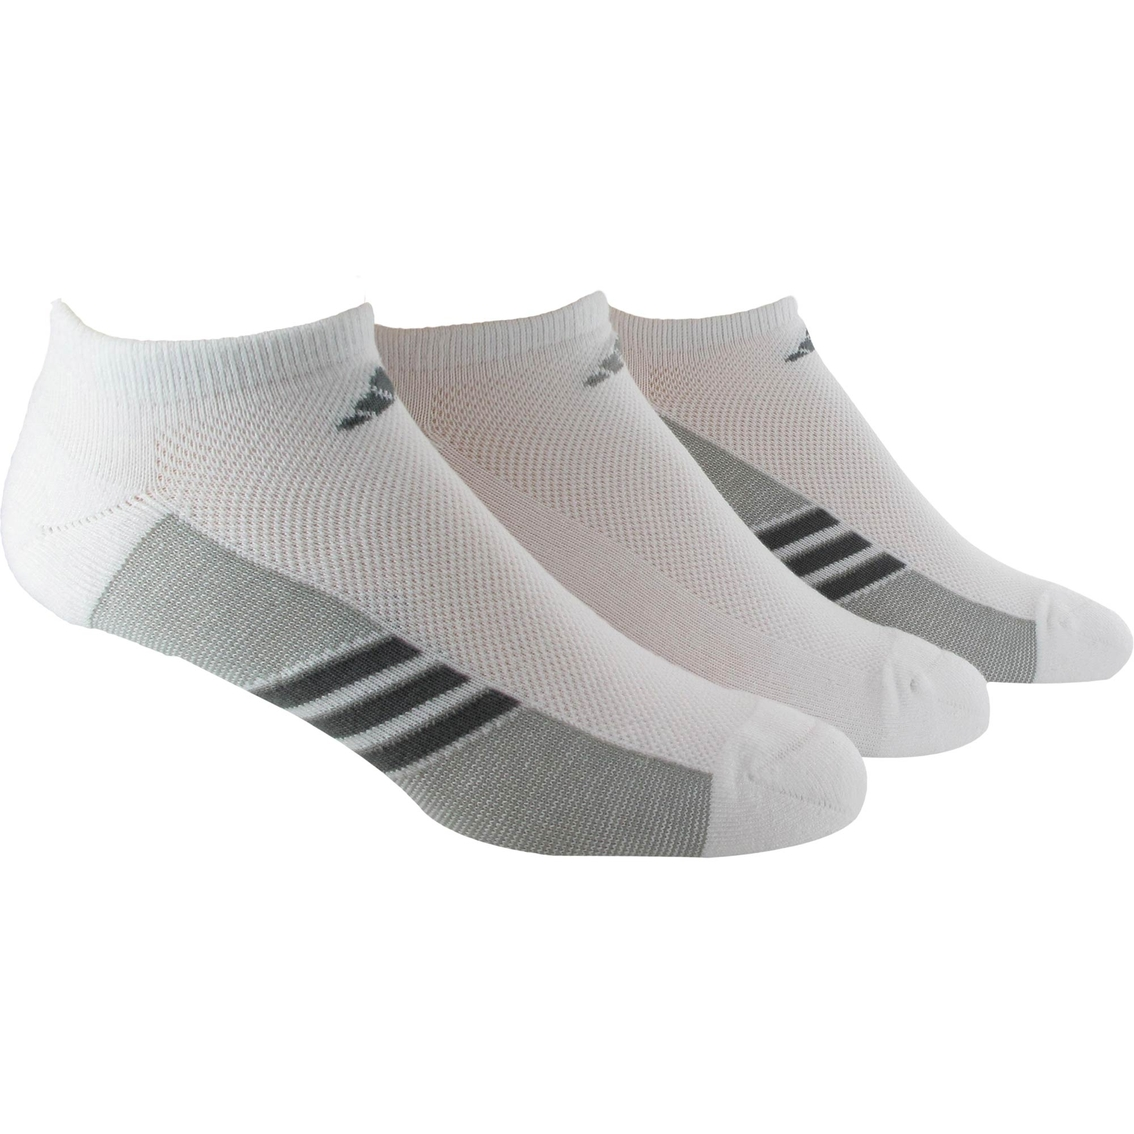 d69bd52fd91ca Adidas Men's Climacool Superlite No Show Socks 3 Pk. | Socks ...